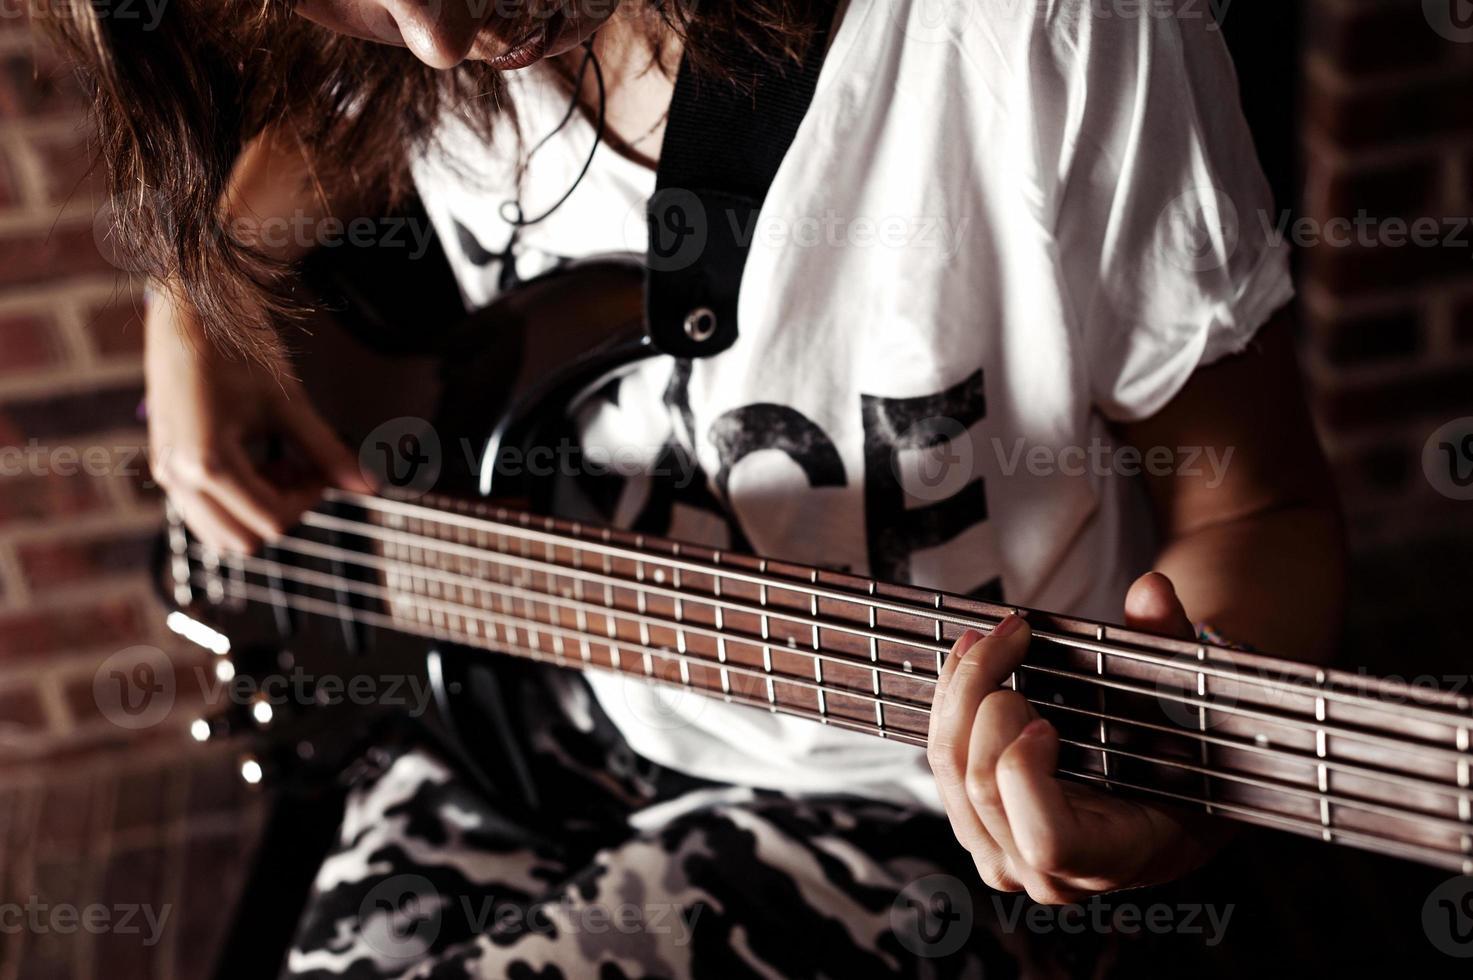 Teenage caucasian puk girl sitting and playing bass guitar closeup photo